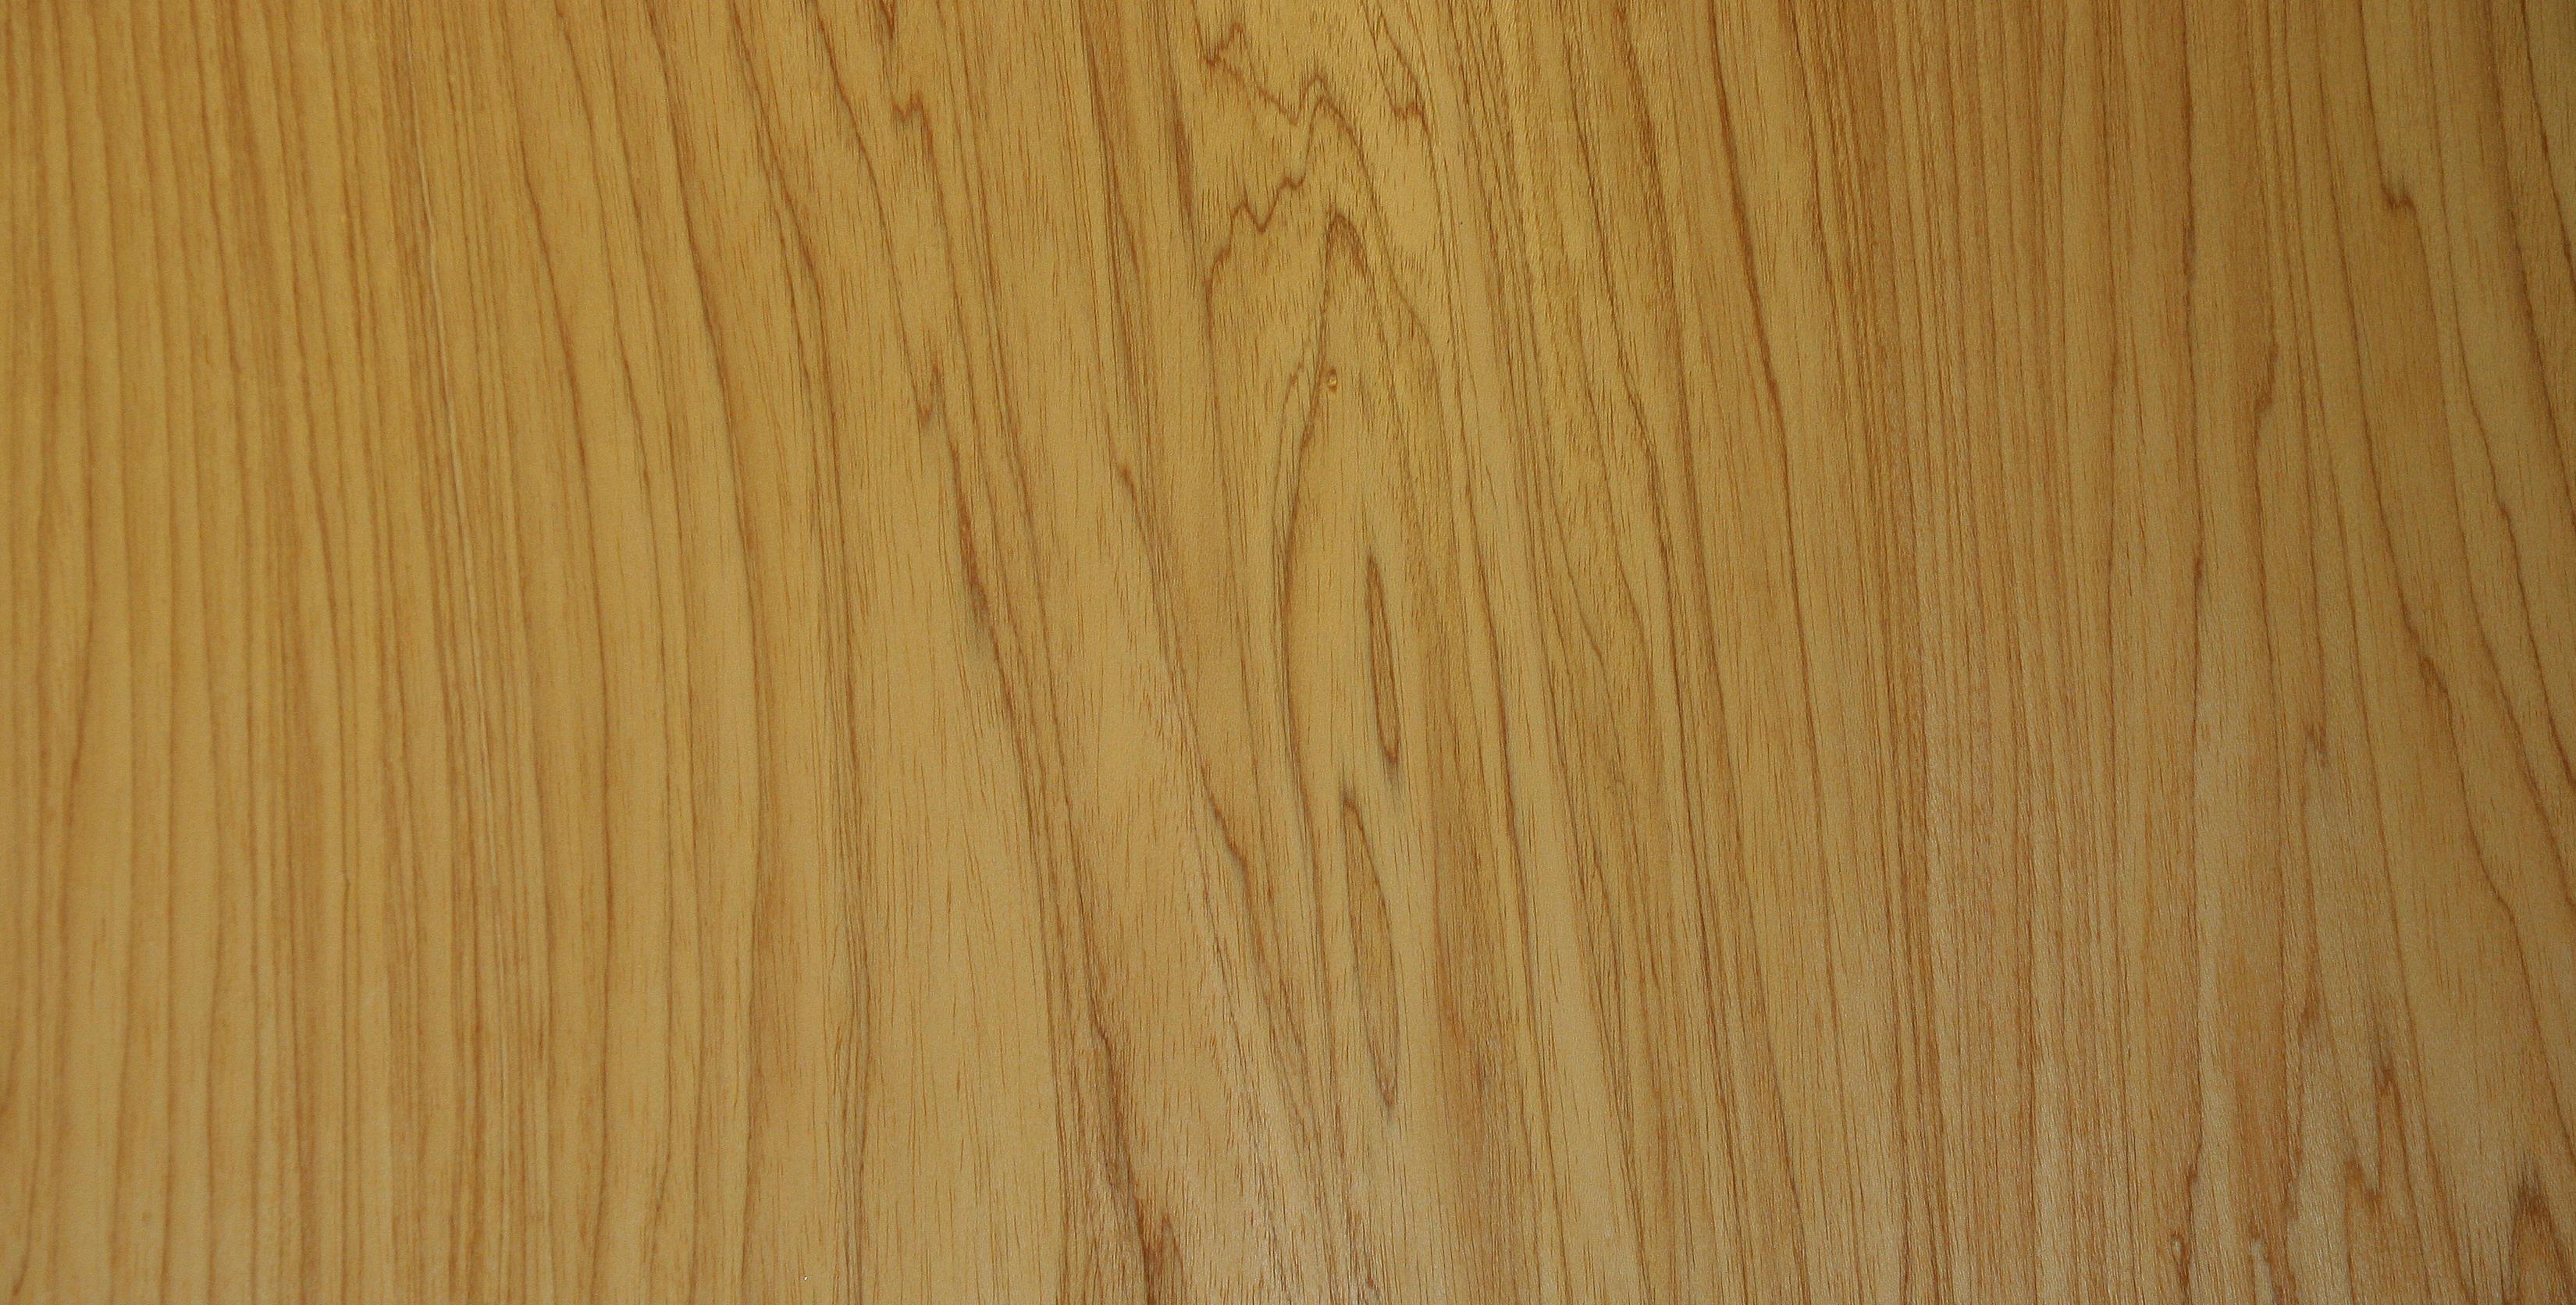 Wood Grain Texture wood grainhatch1921 on deviantart